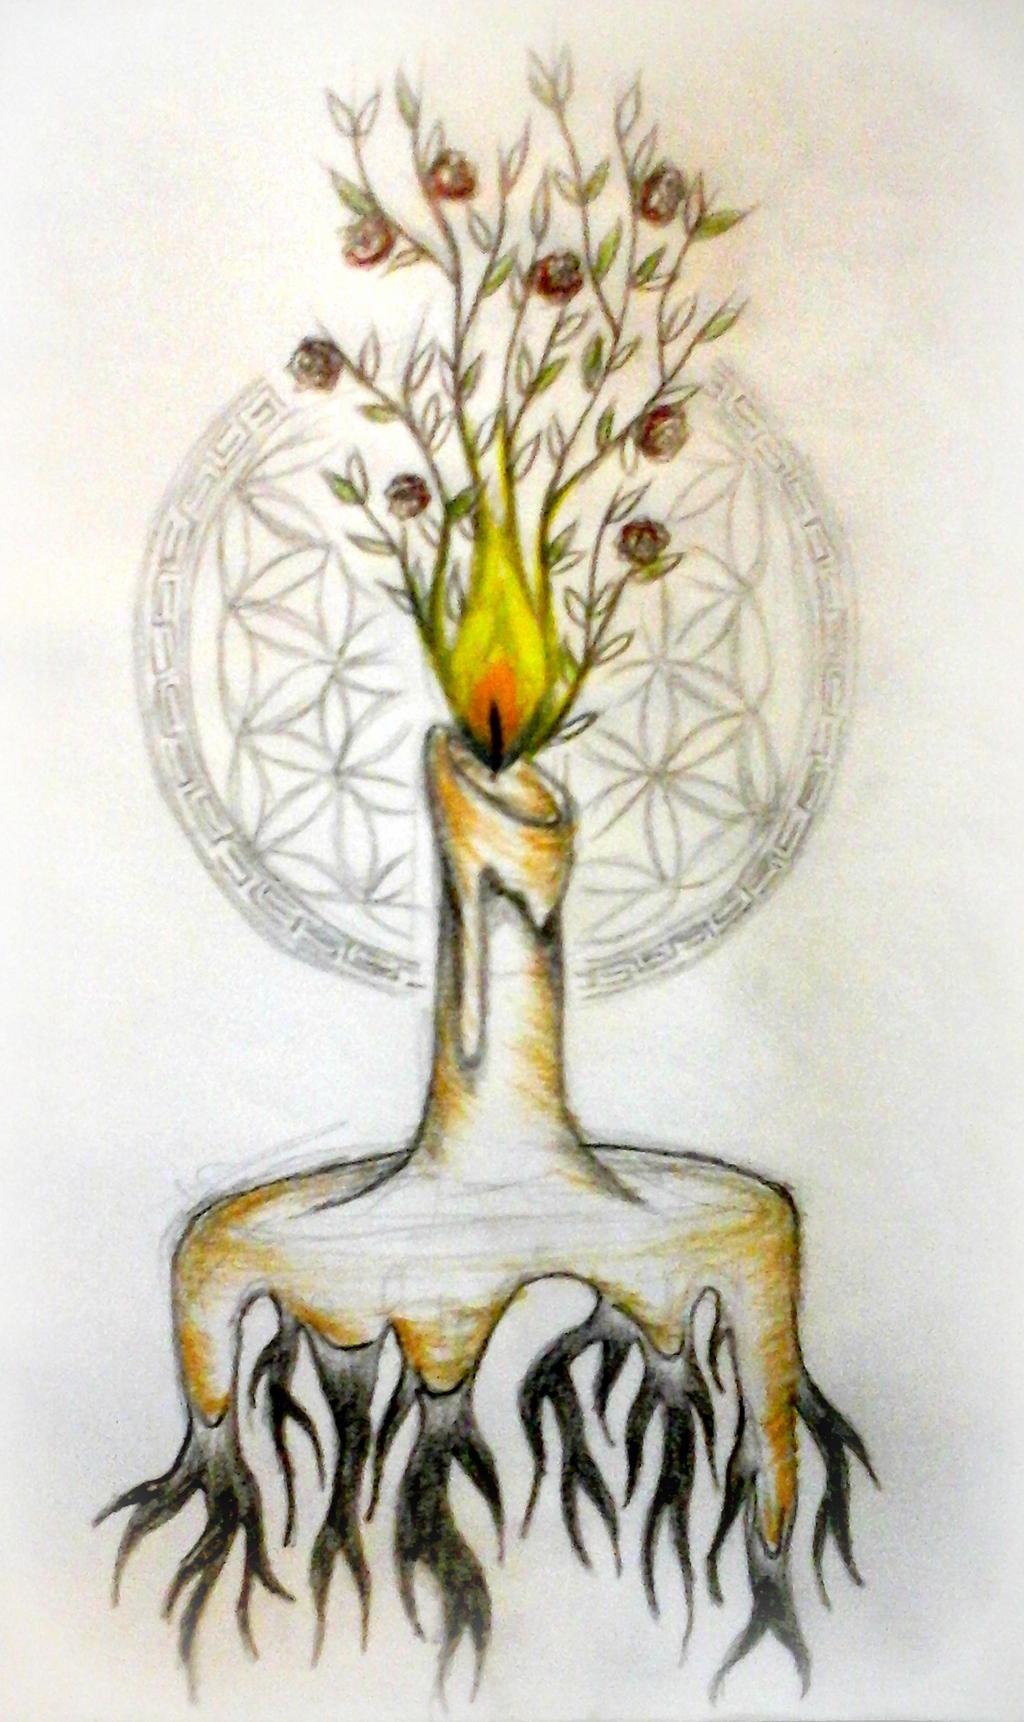 Illumination, Revelation, Life by not-important-at-all